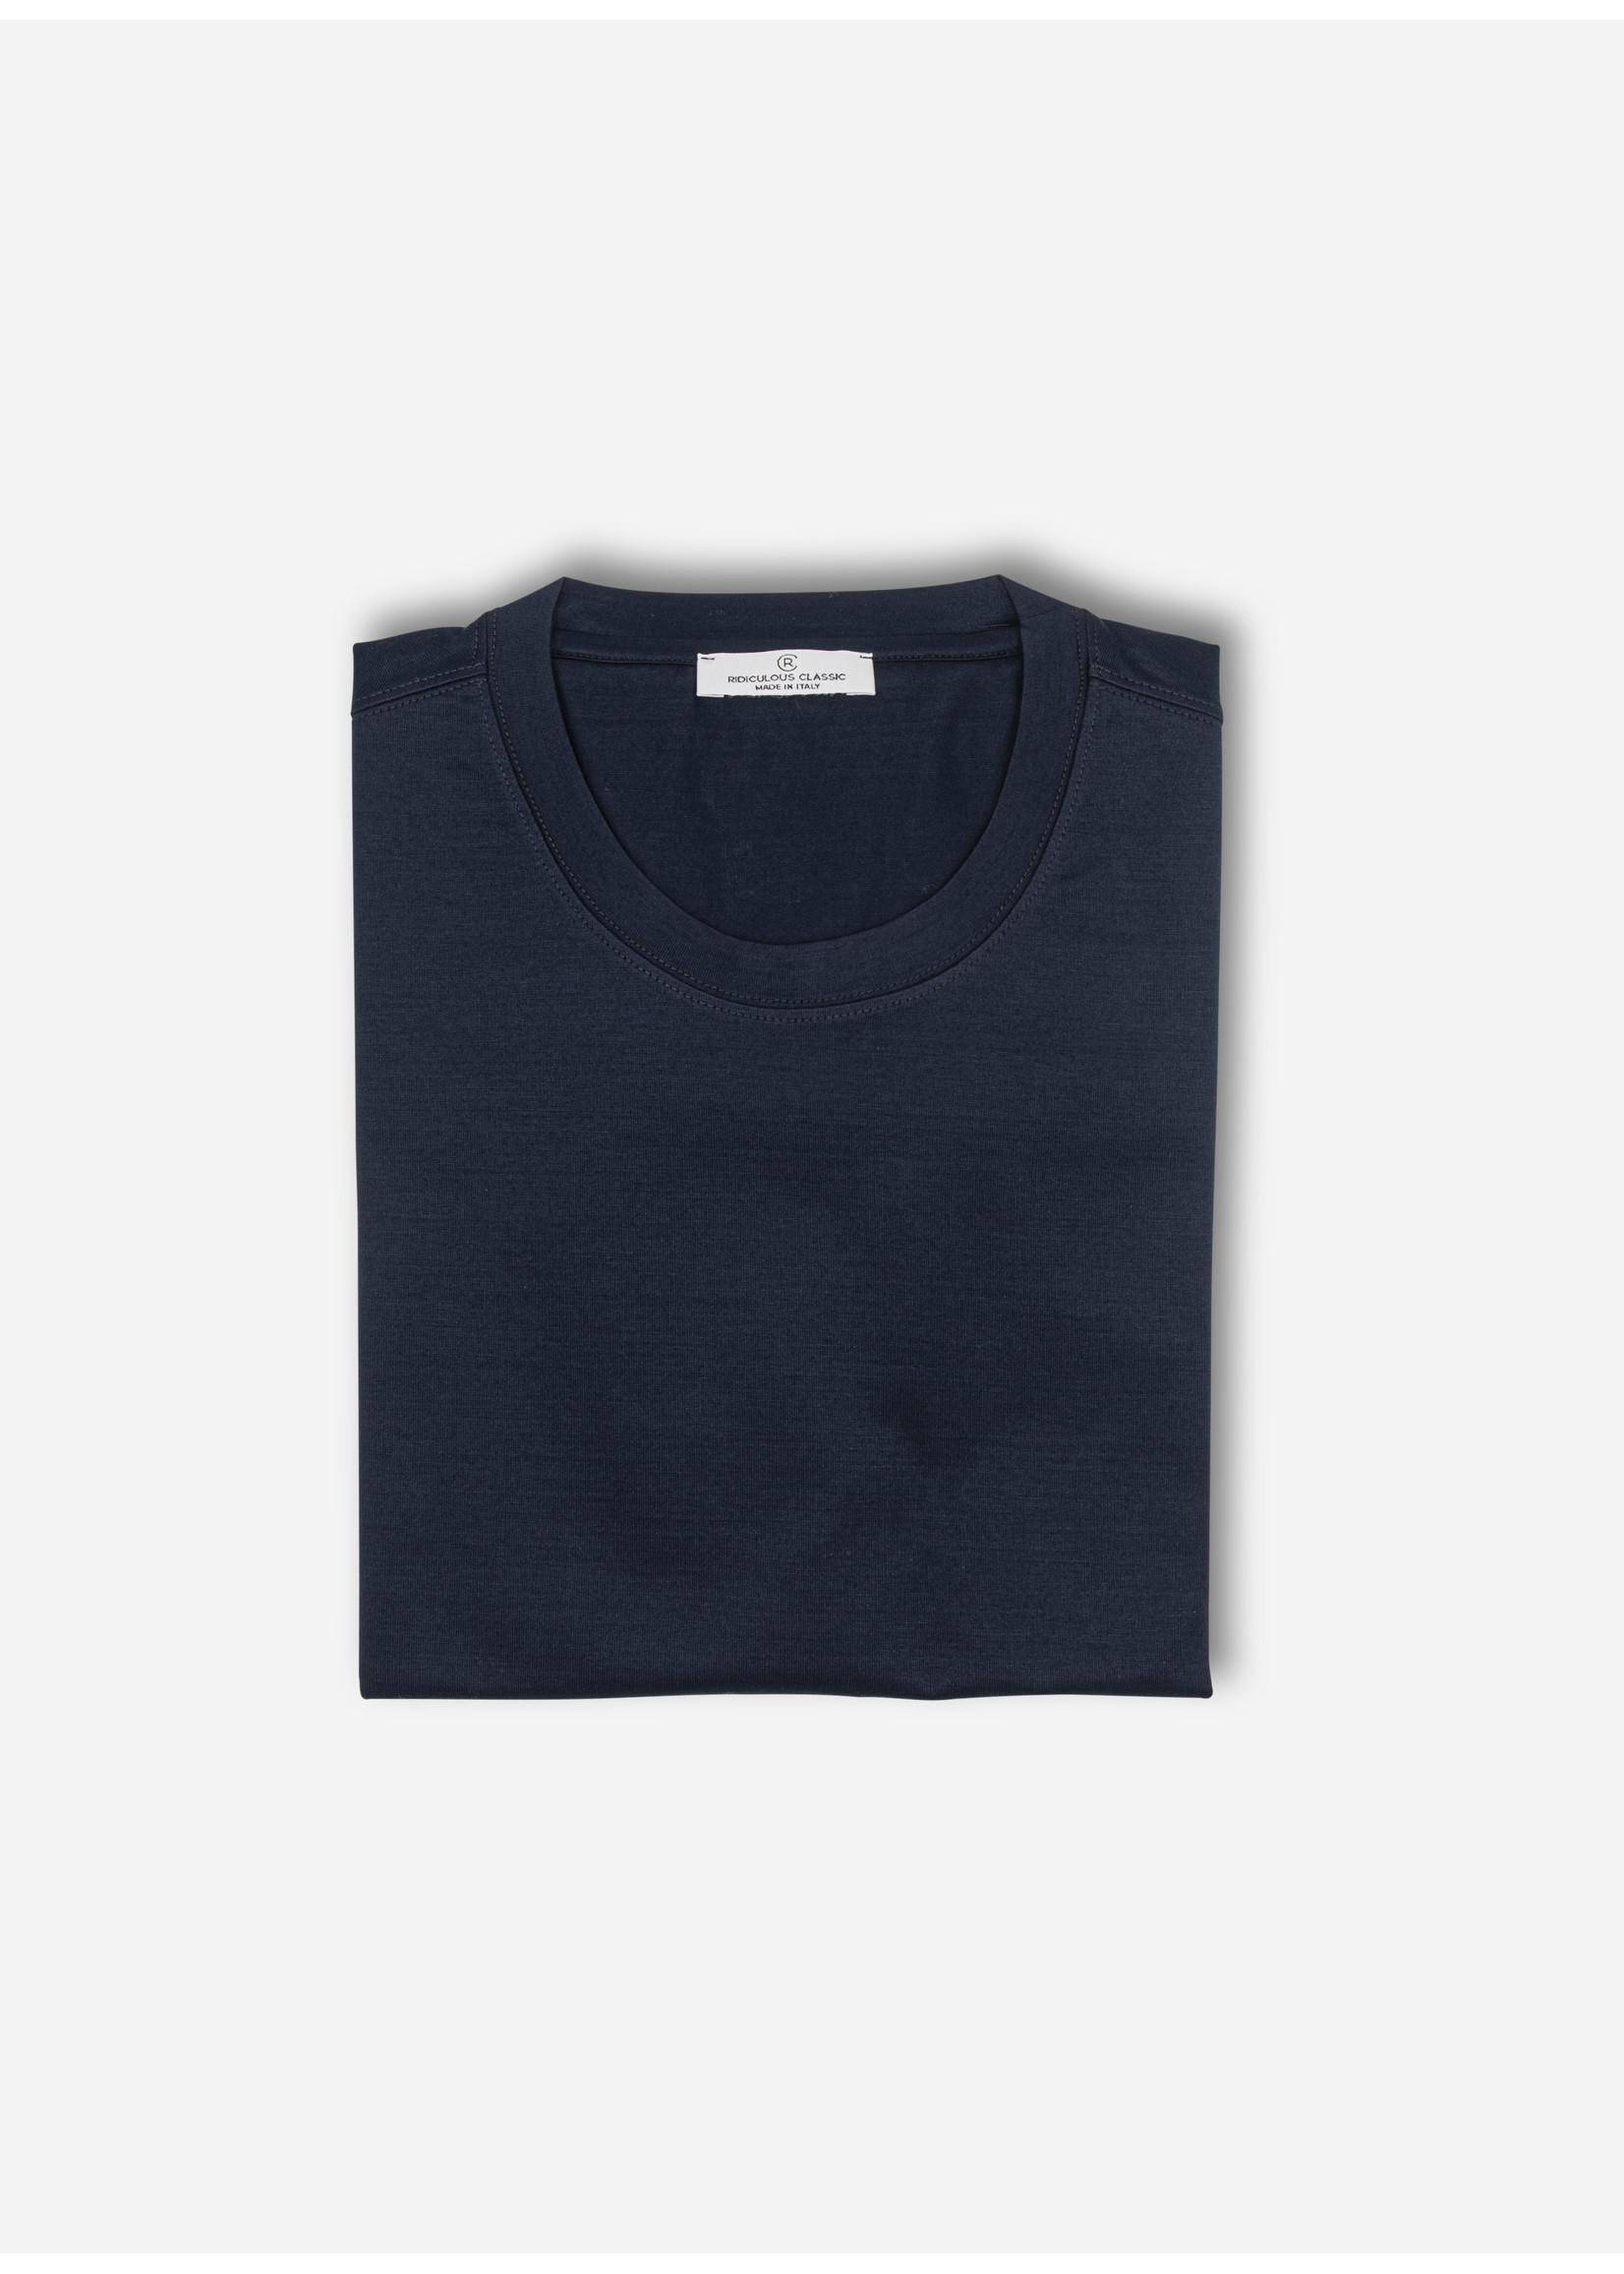 Ridiculous Classic Tshirt navy